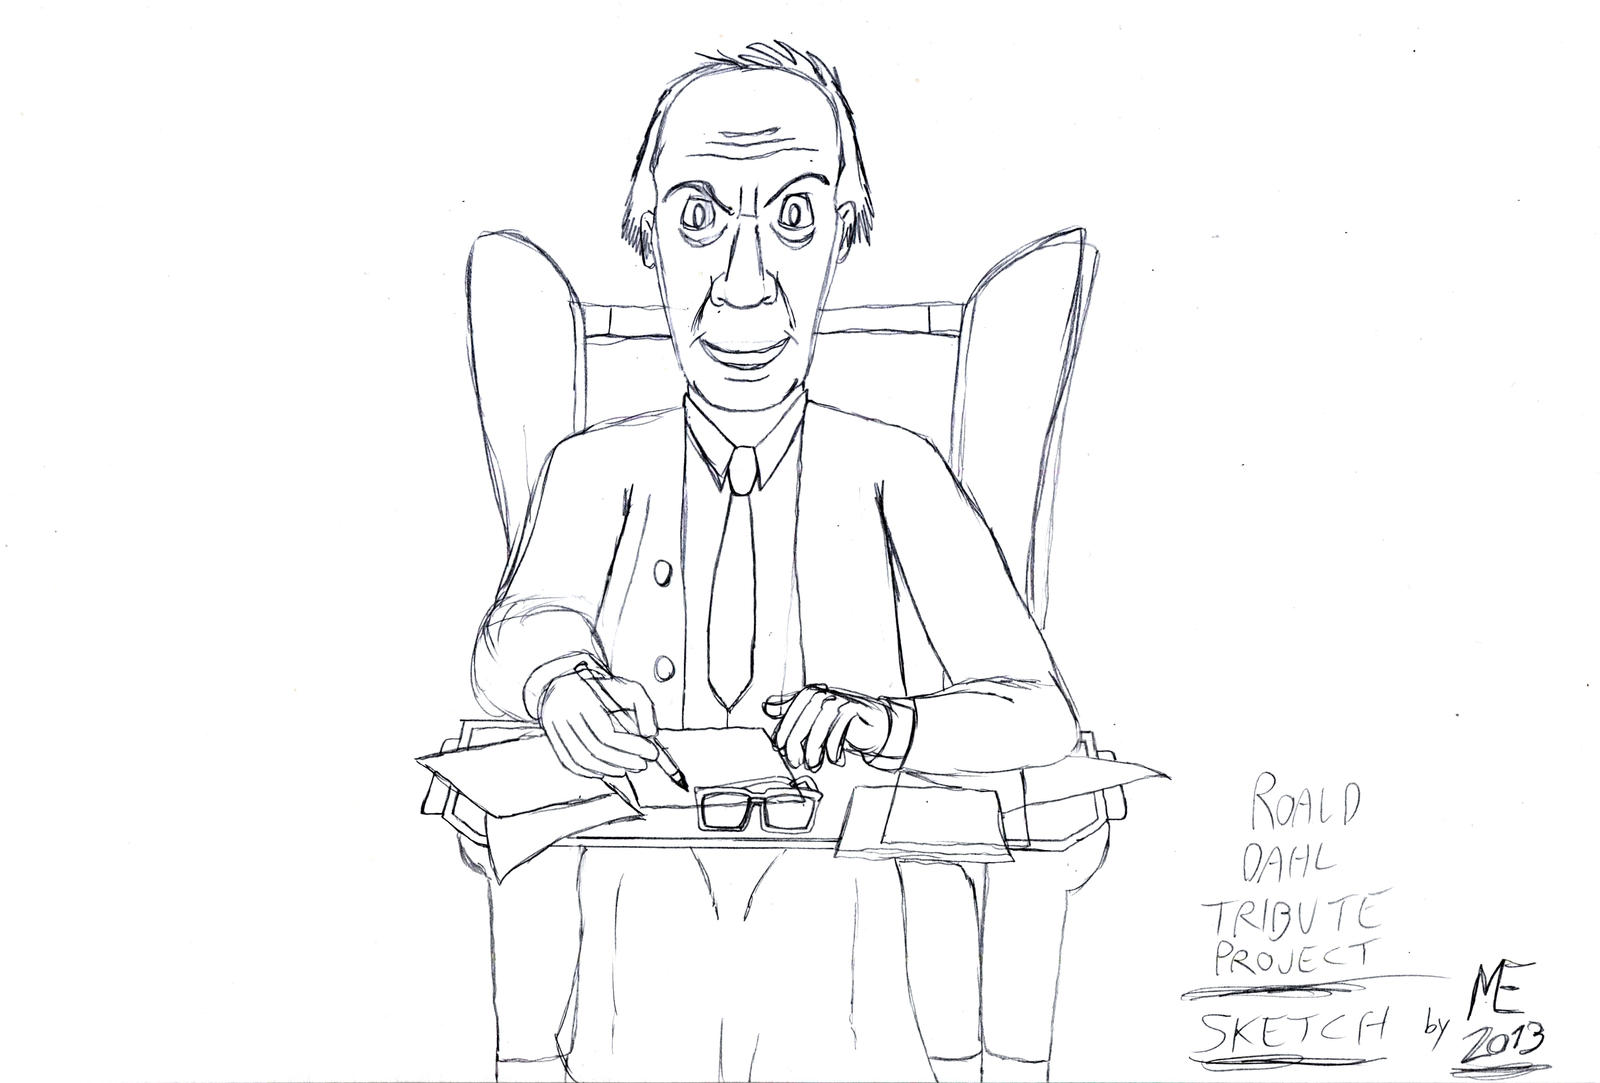 My Roald Dahl Tribute Sketch By Morteneng21 On Deviantart